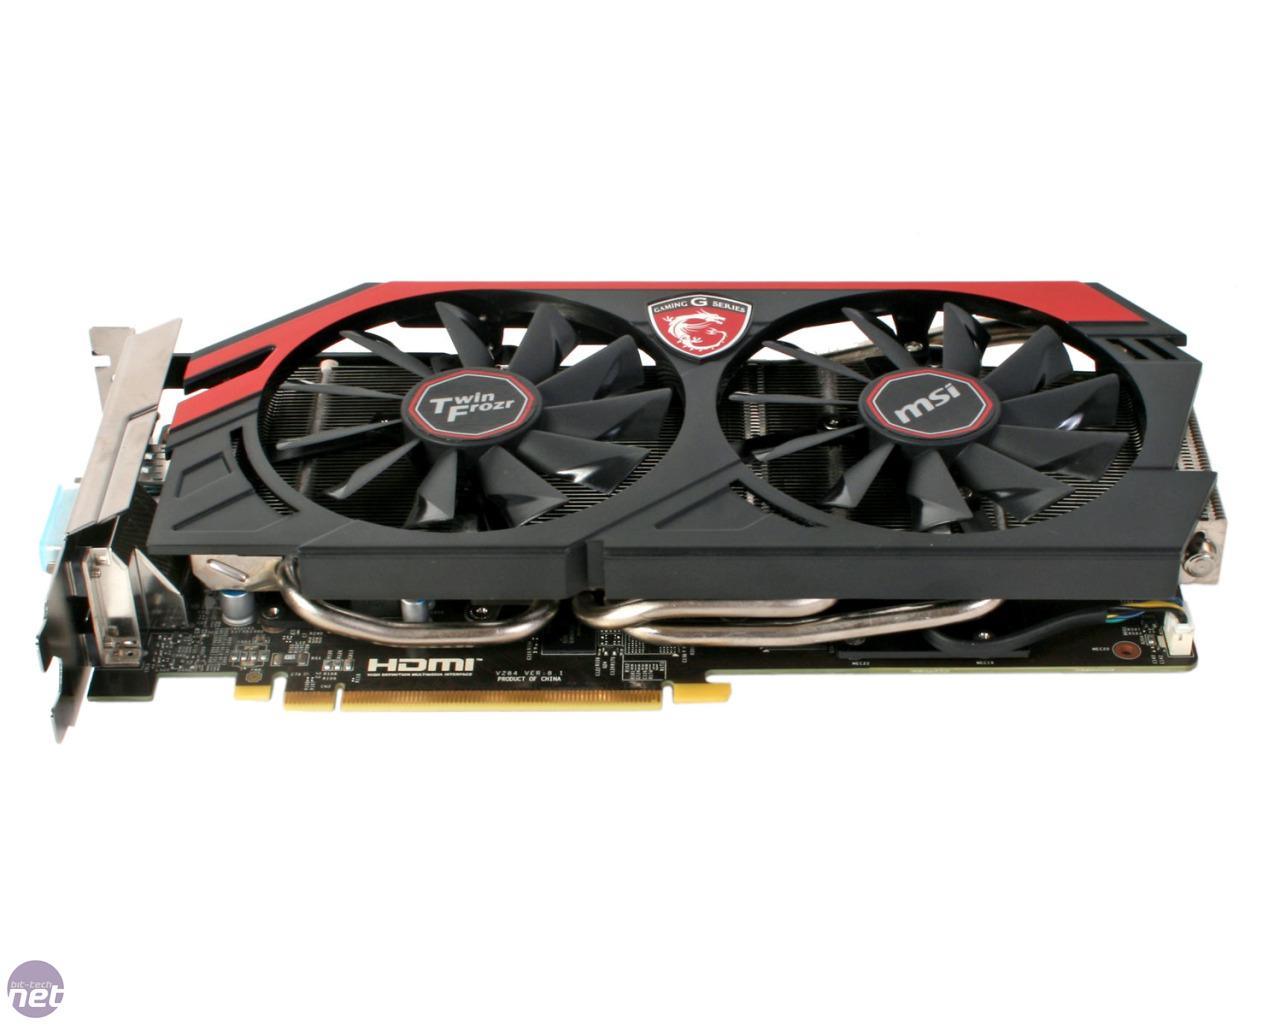 Msi Geforce Gtx 760 Twin Frozr Oc 2gb Review Bit Tech Net